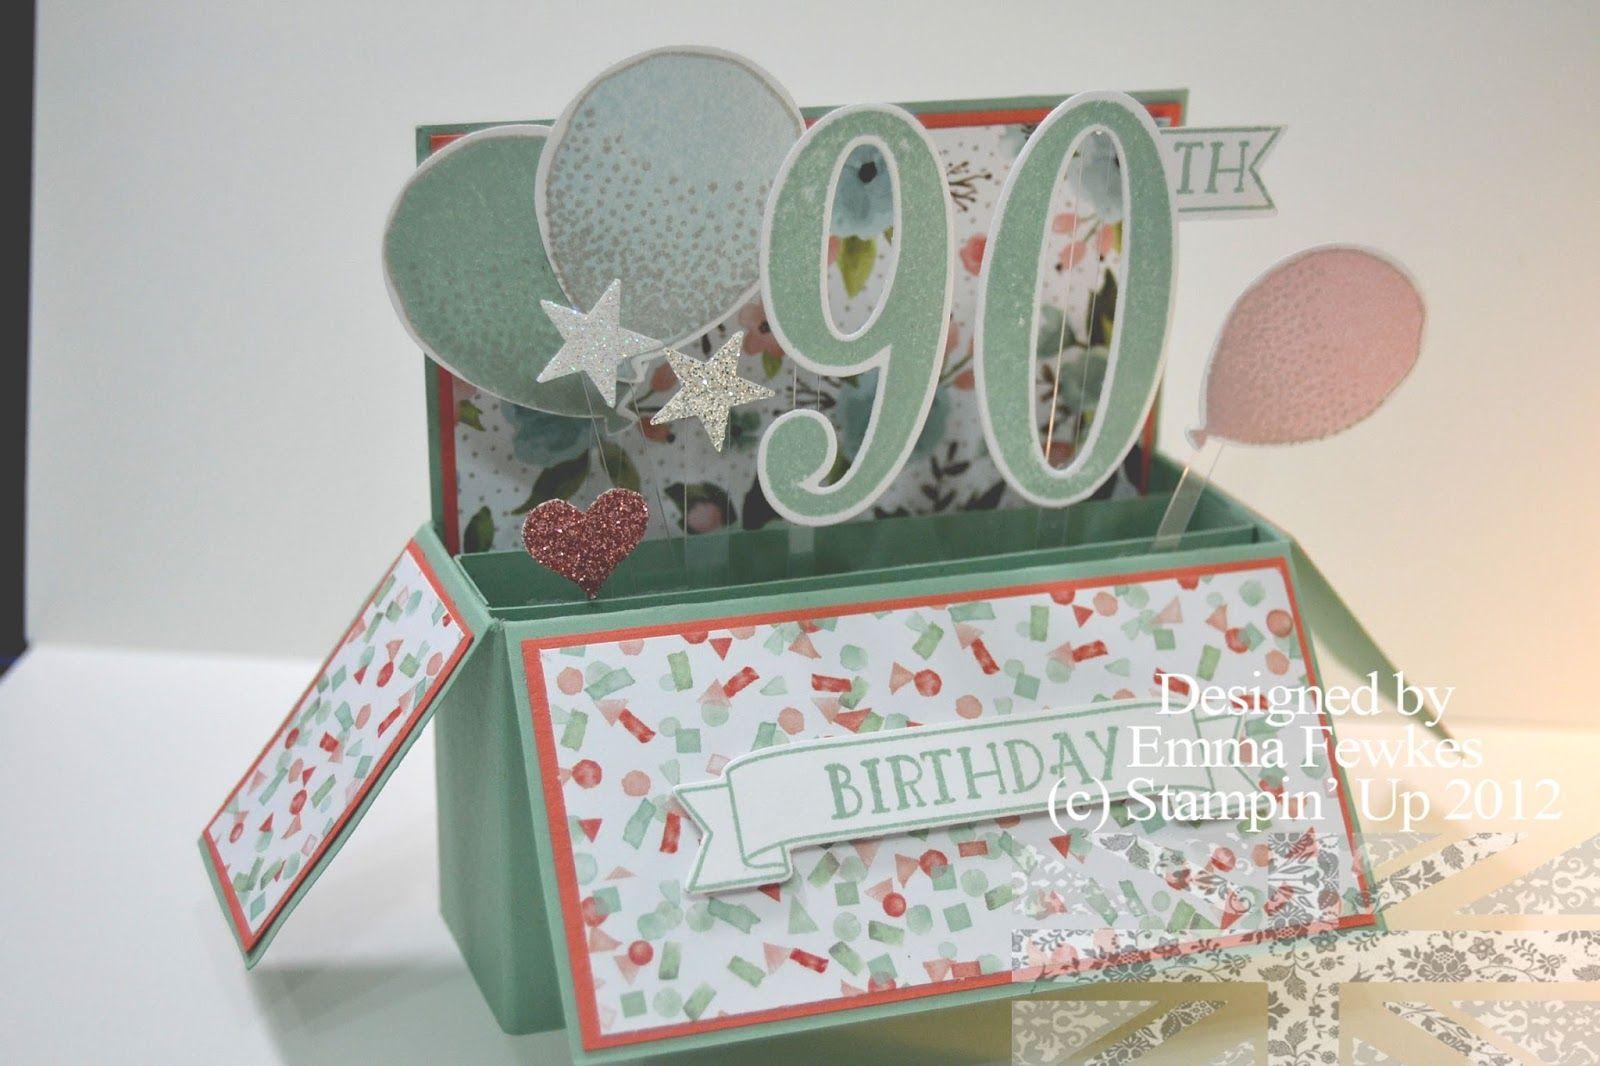 90th 70th Birthday Boxes Birthday Card Pop Up 70th Birthday Card 90th Birthday Cards